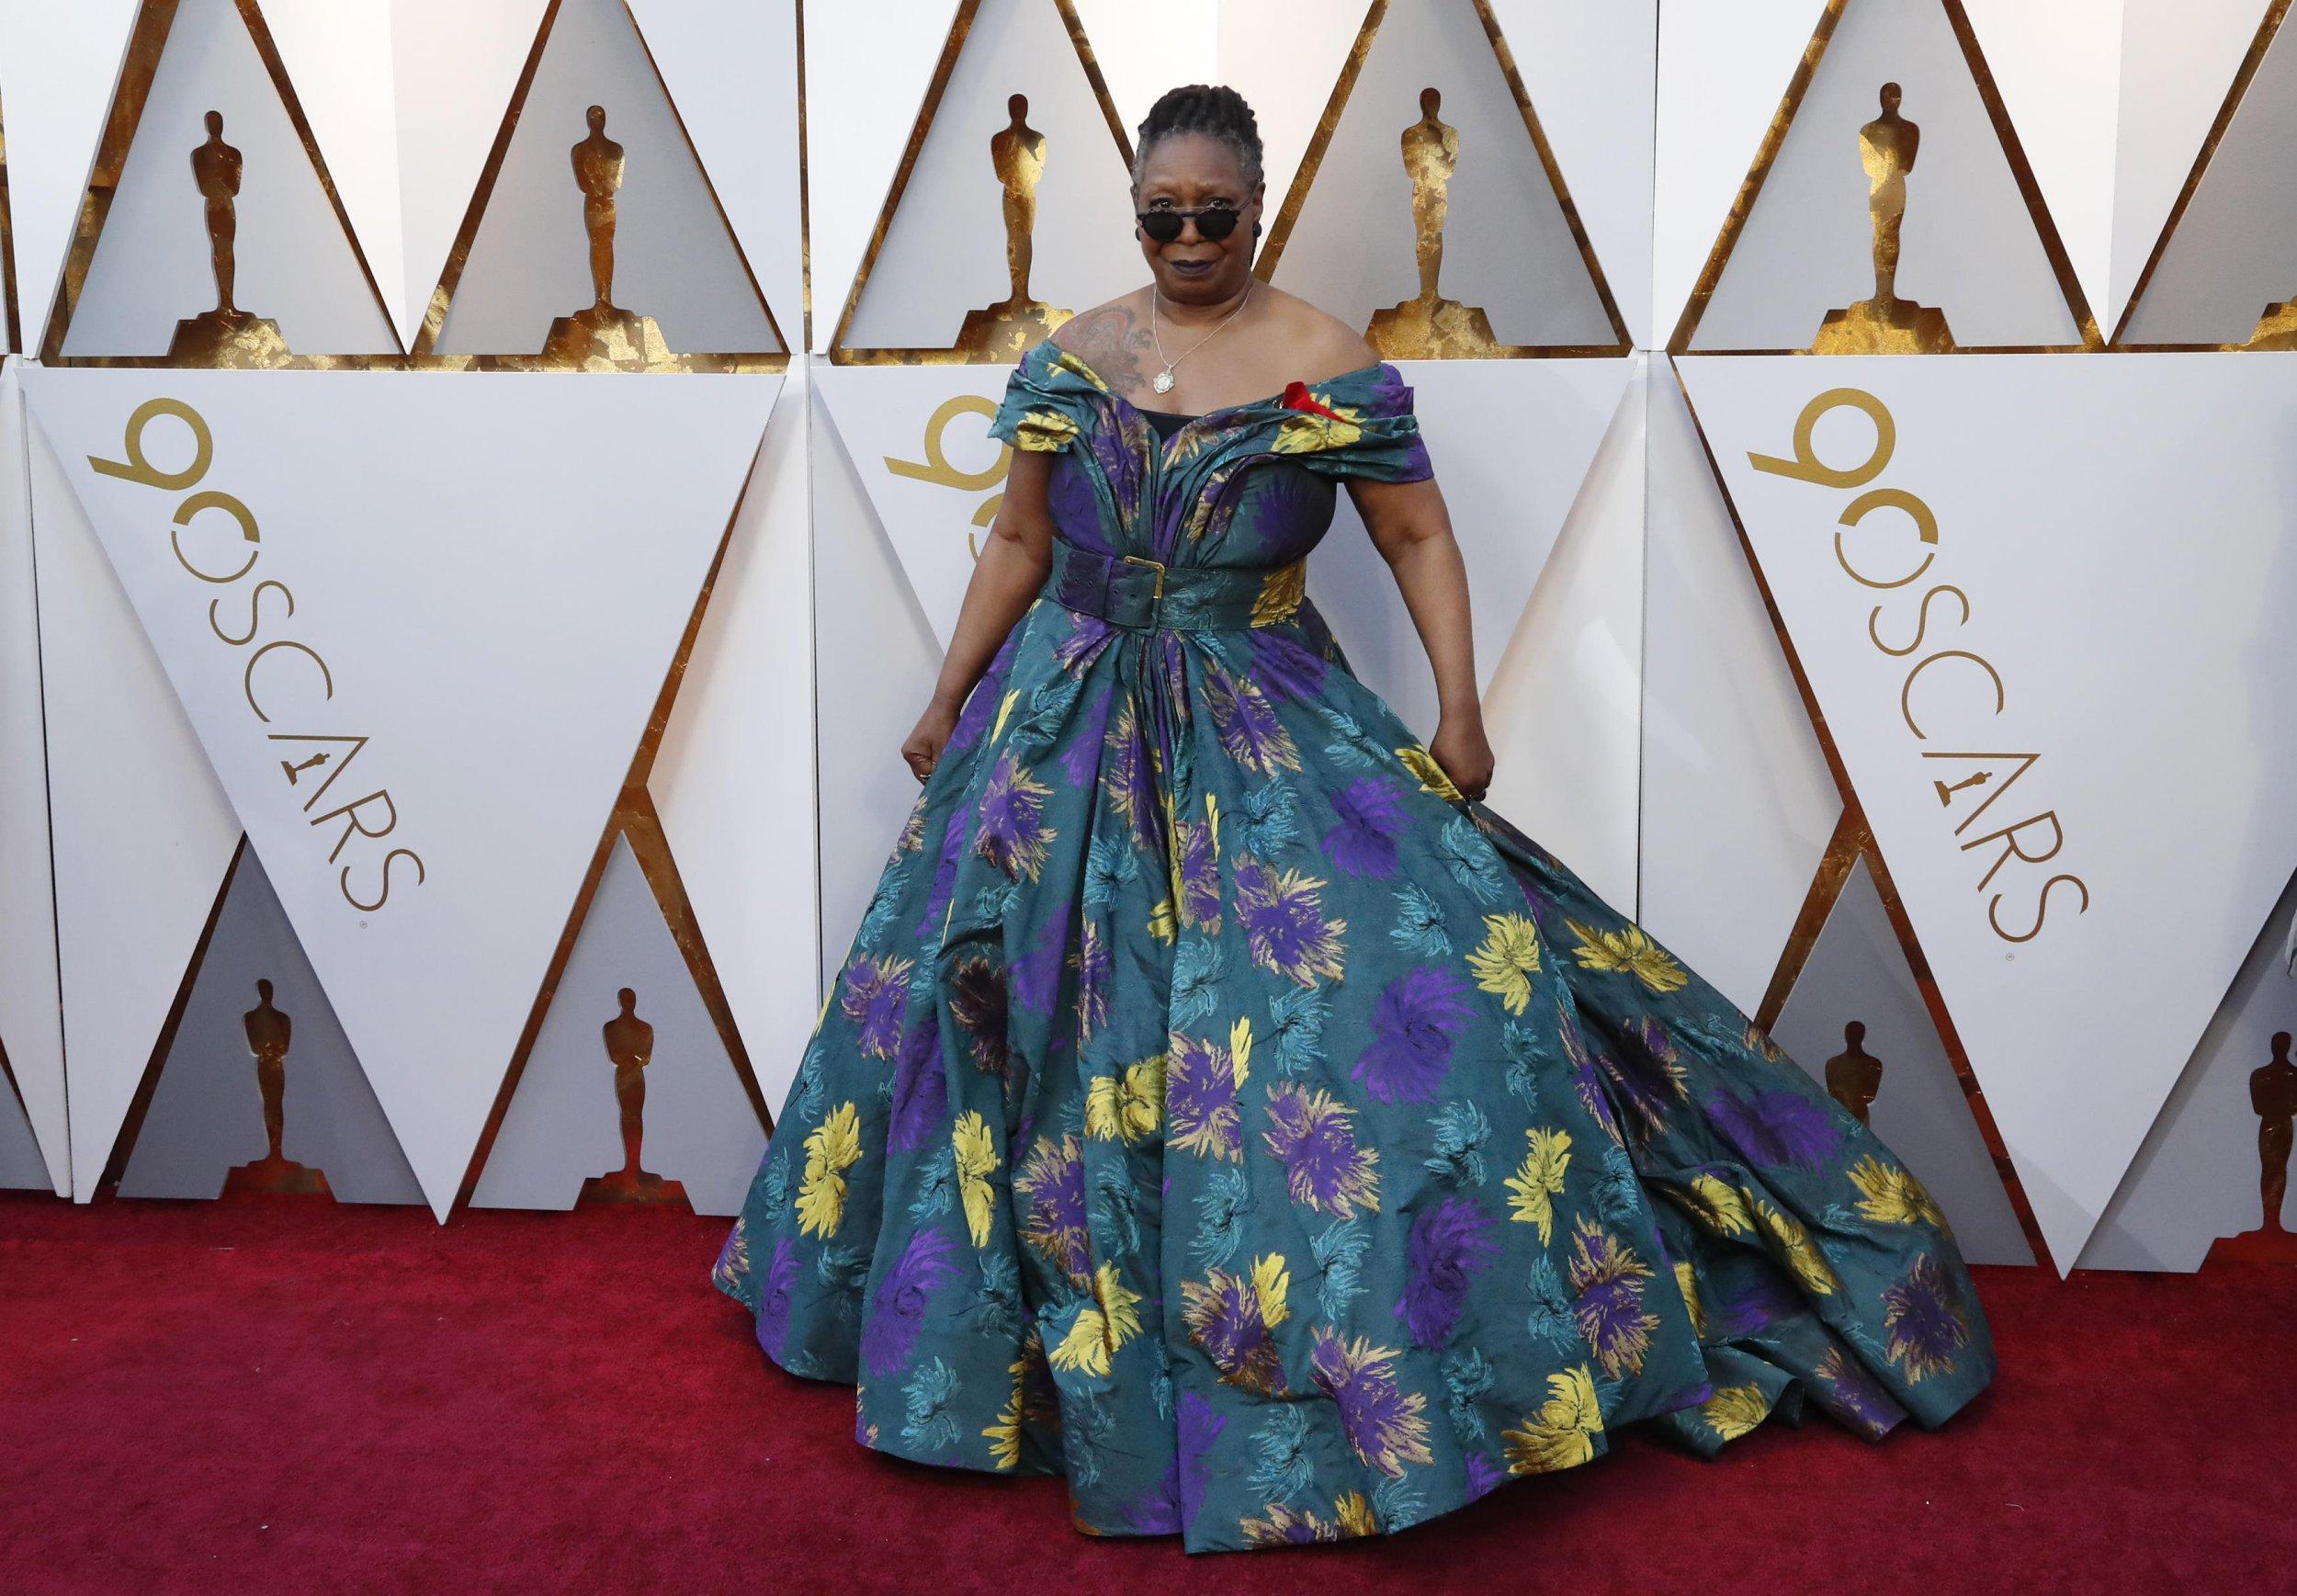 Whoopi Goldberg's floral Christian Siriano Oscars dress has pockets